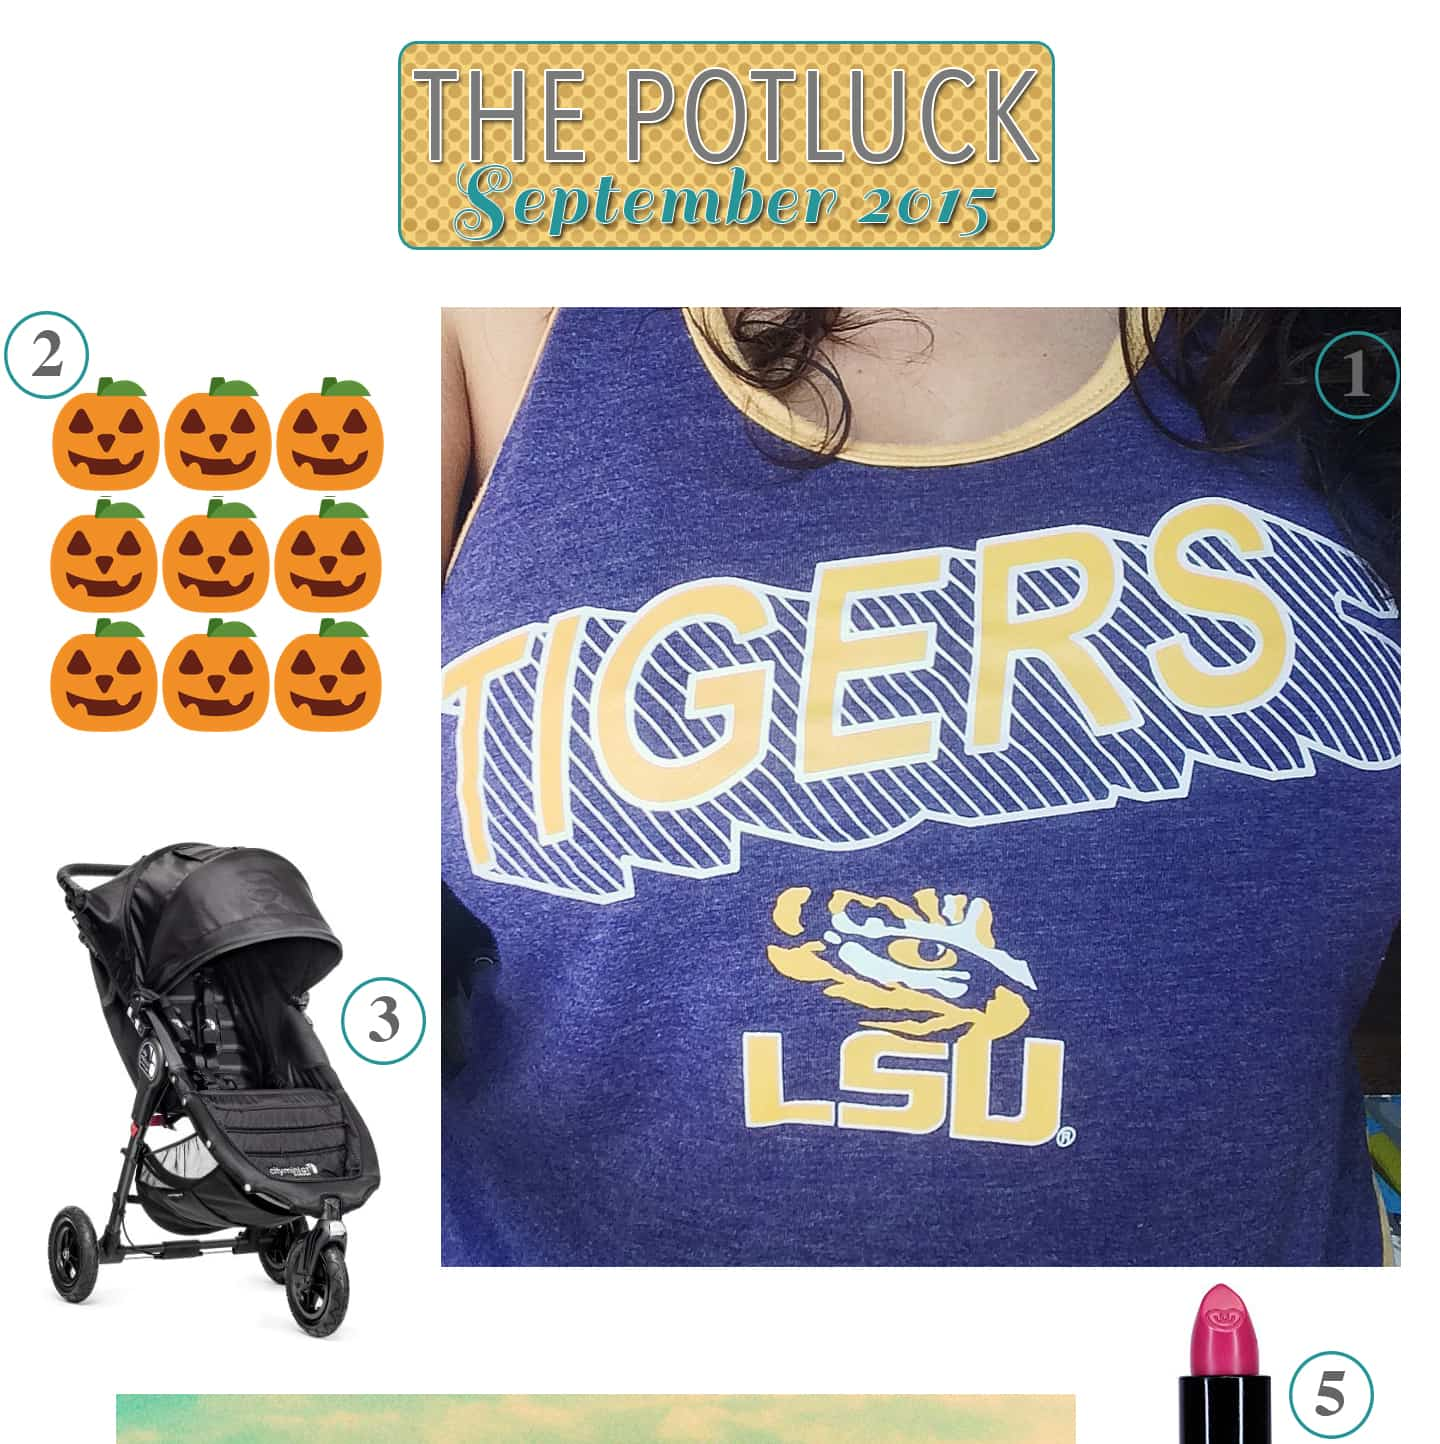 The Potluck: September 2015